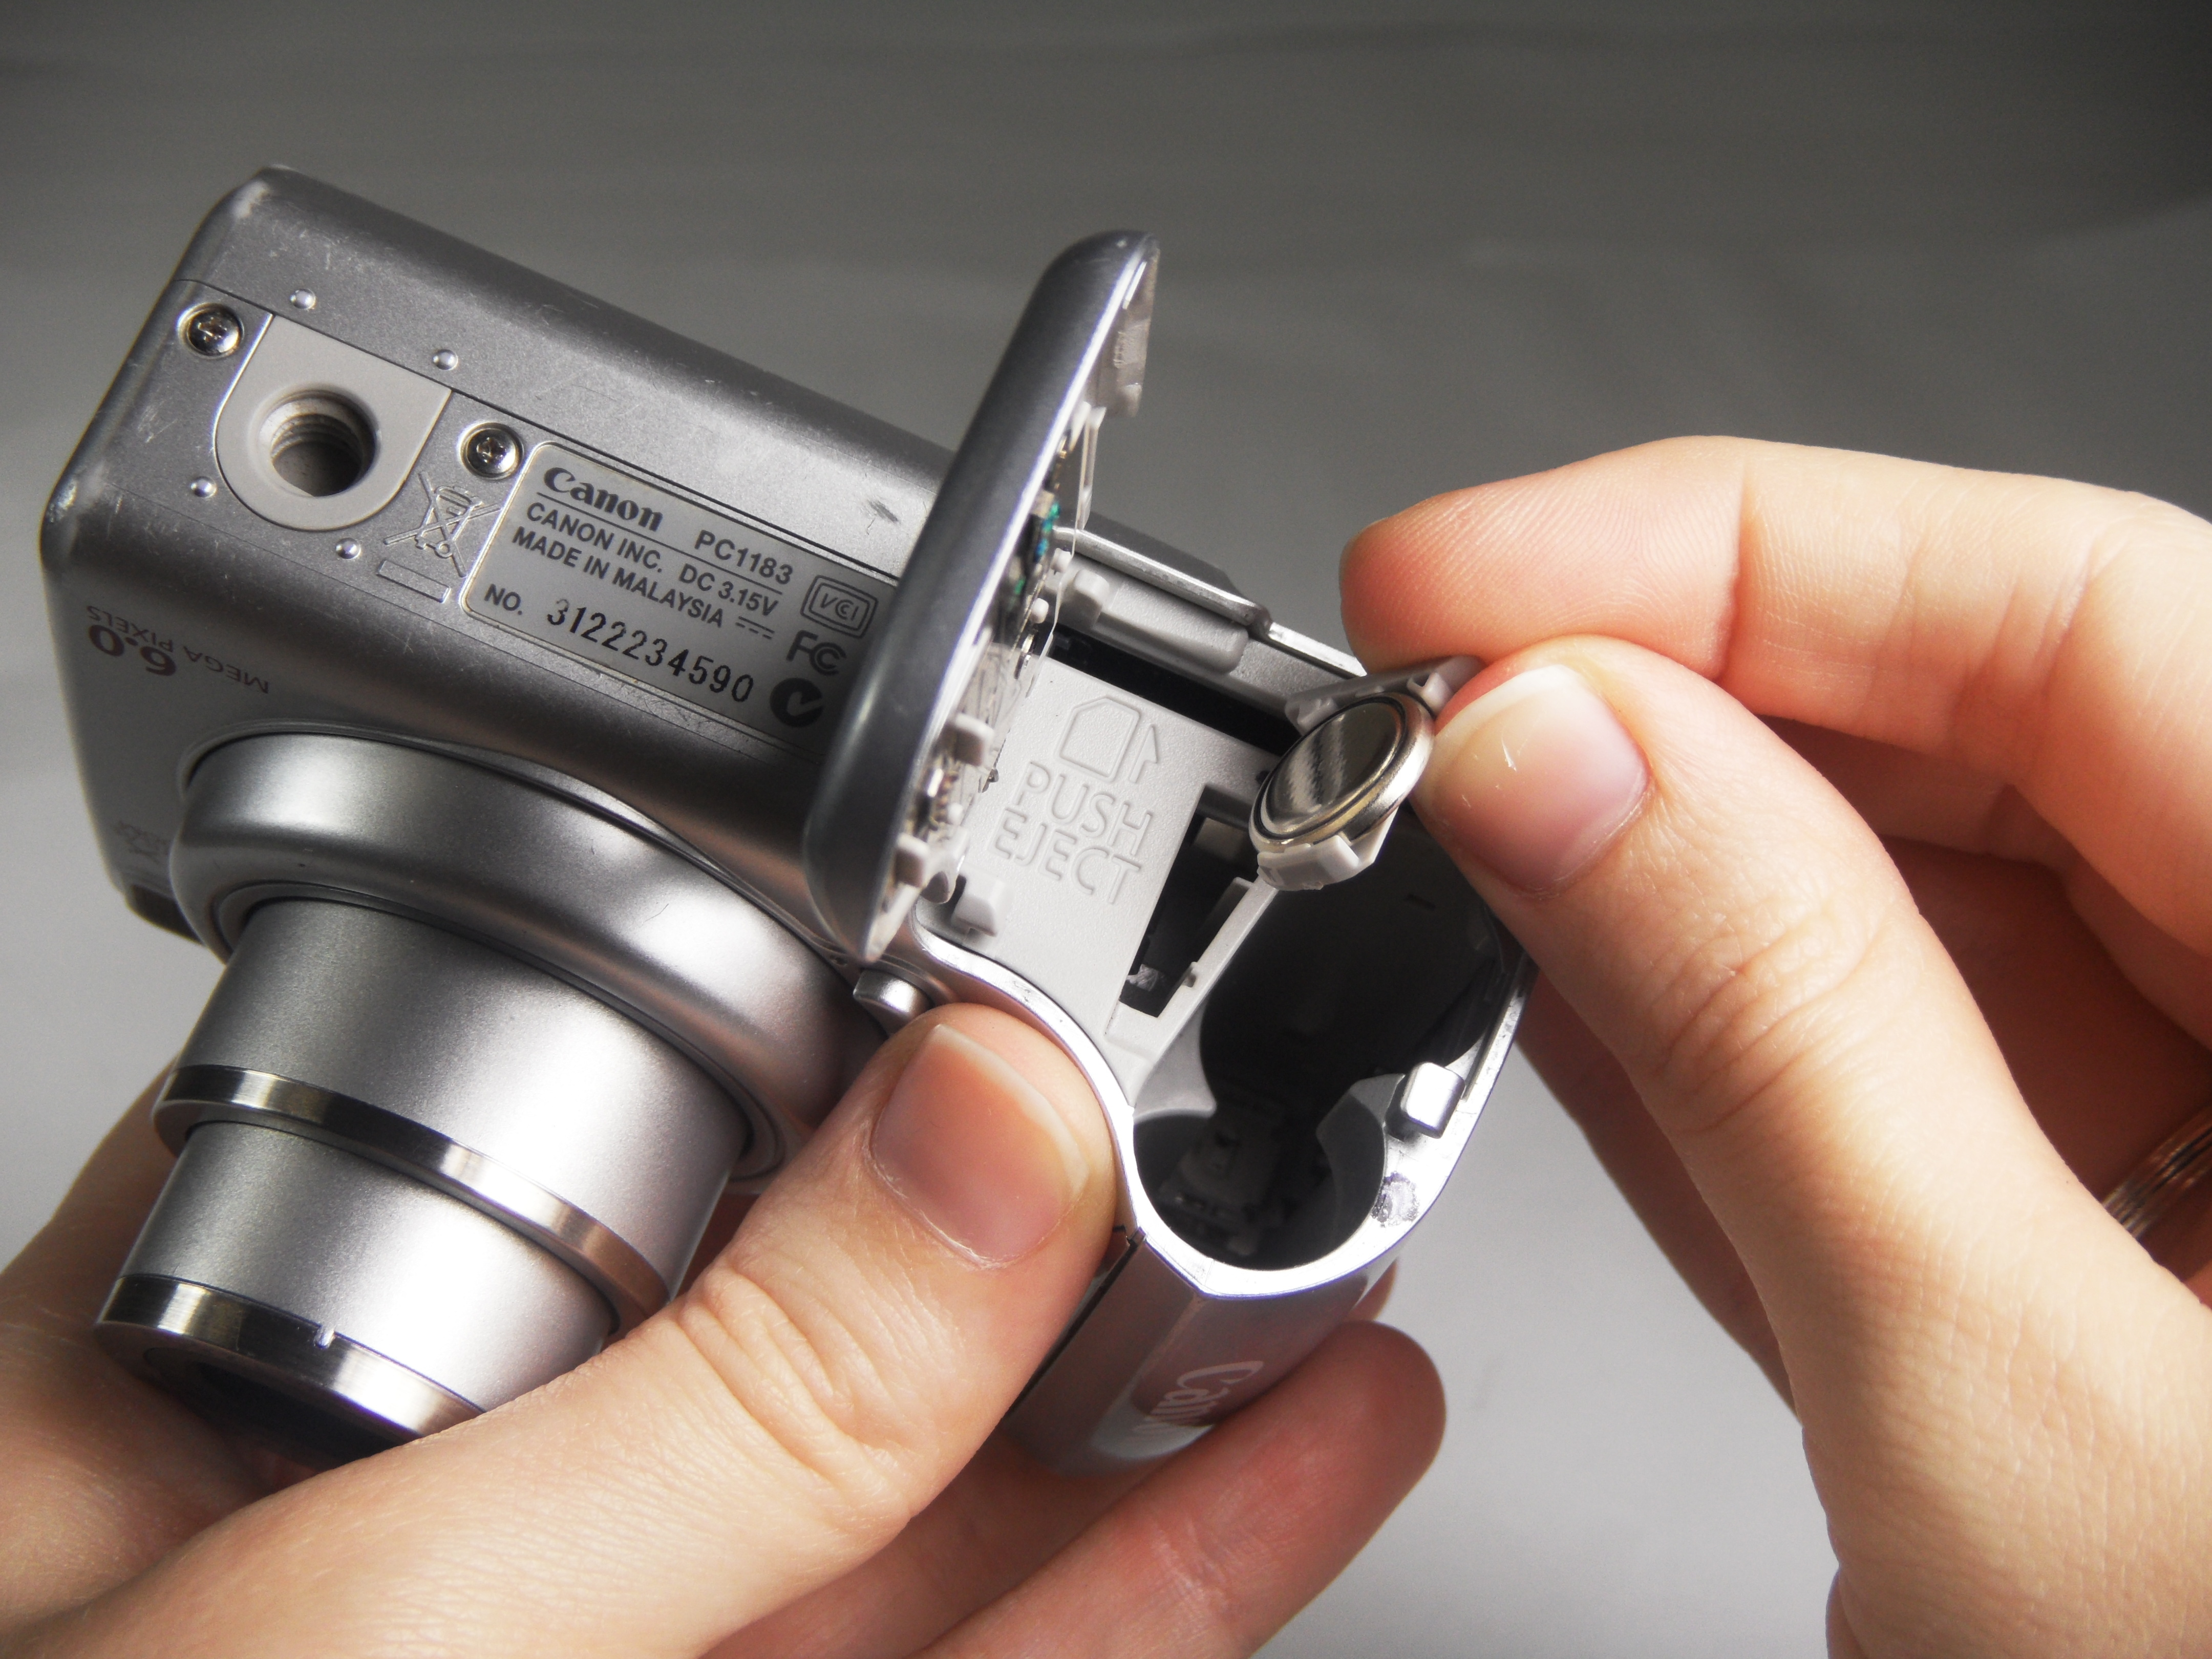 canon powershot a540 repair ifixit rh ifixit com Canon G9 Canon A530 Night Shot